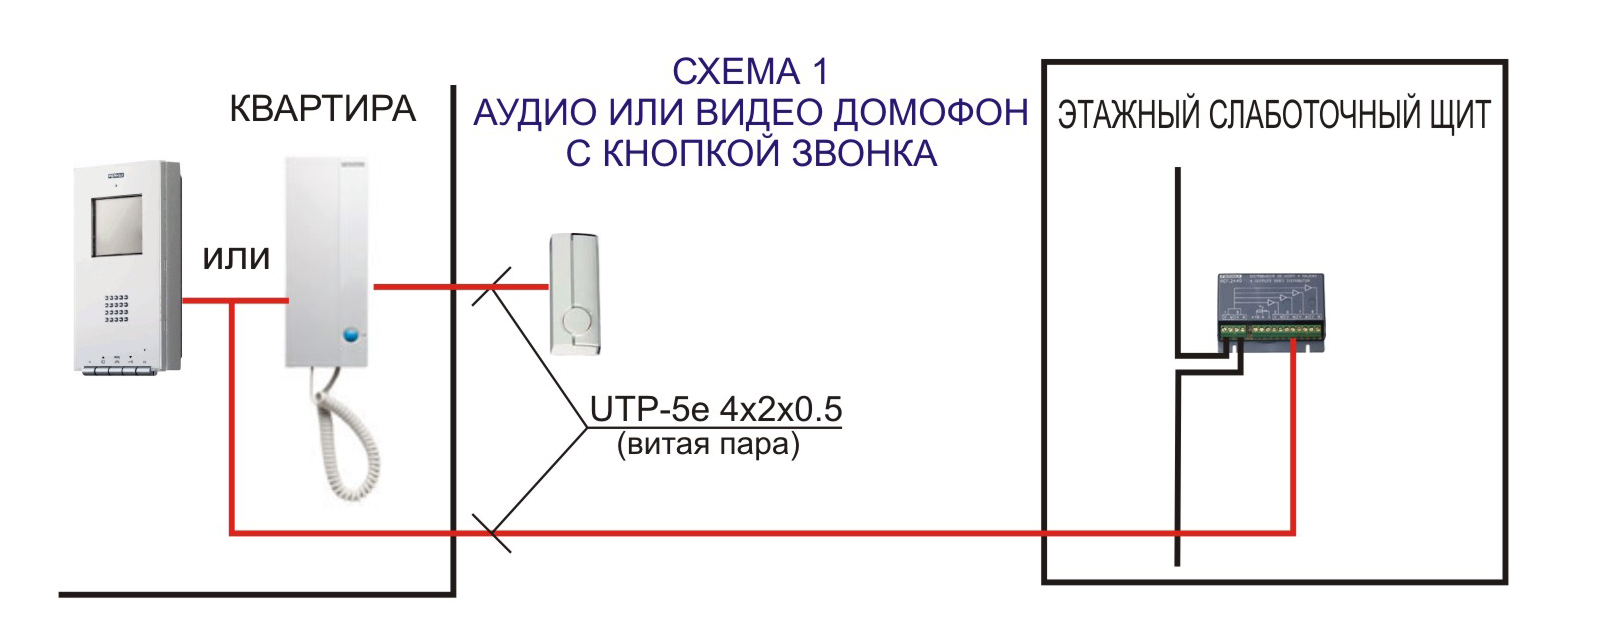 REF:5601 FERMAX - Аудио абонентское устройство  - 1